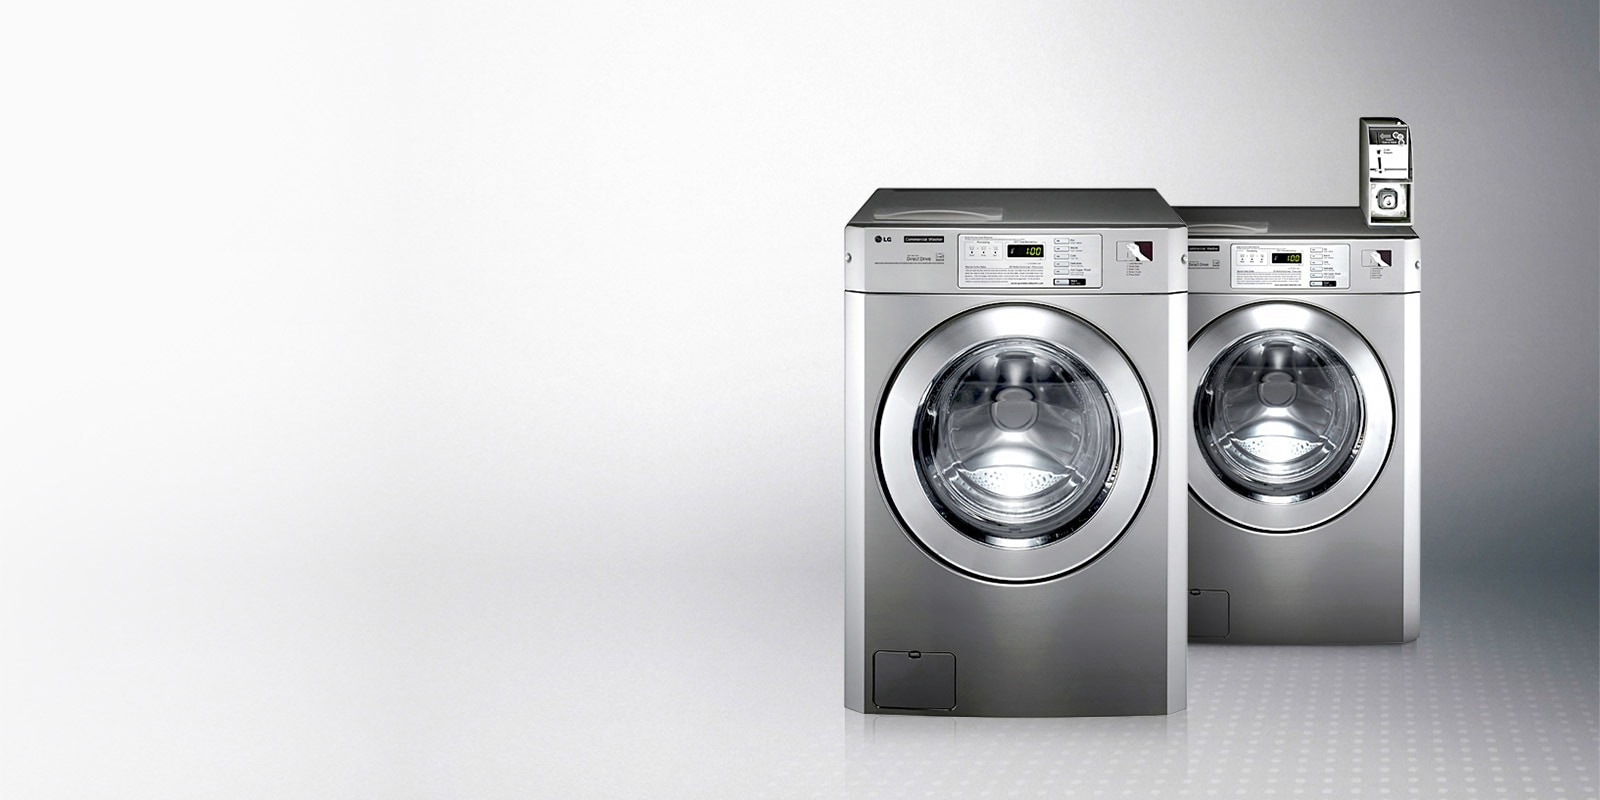 Giant C Washing Machine Commercial Laundry Equipment Lg